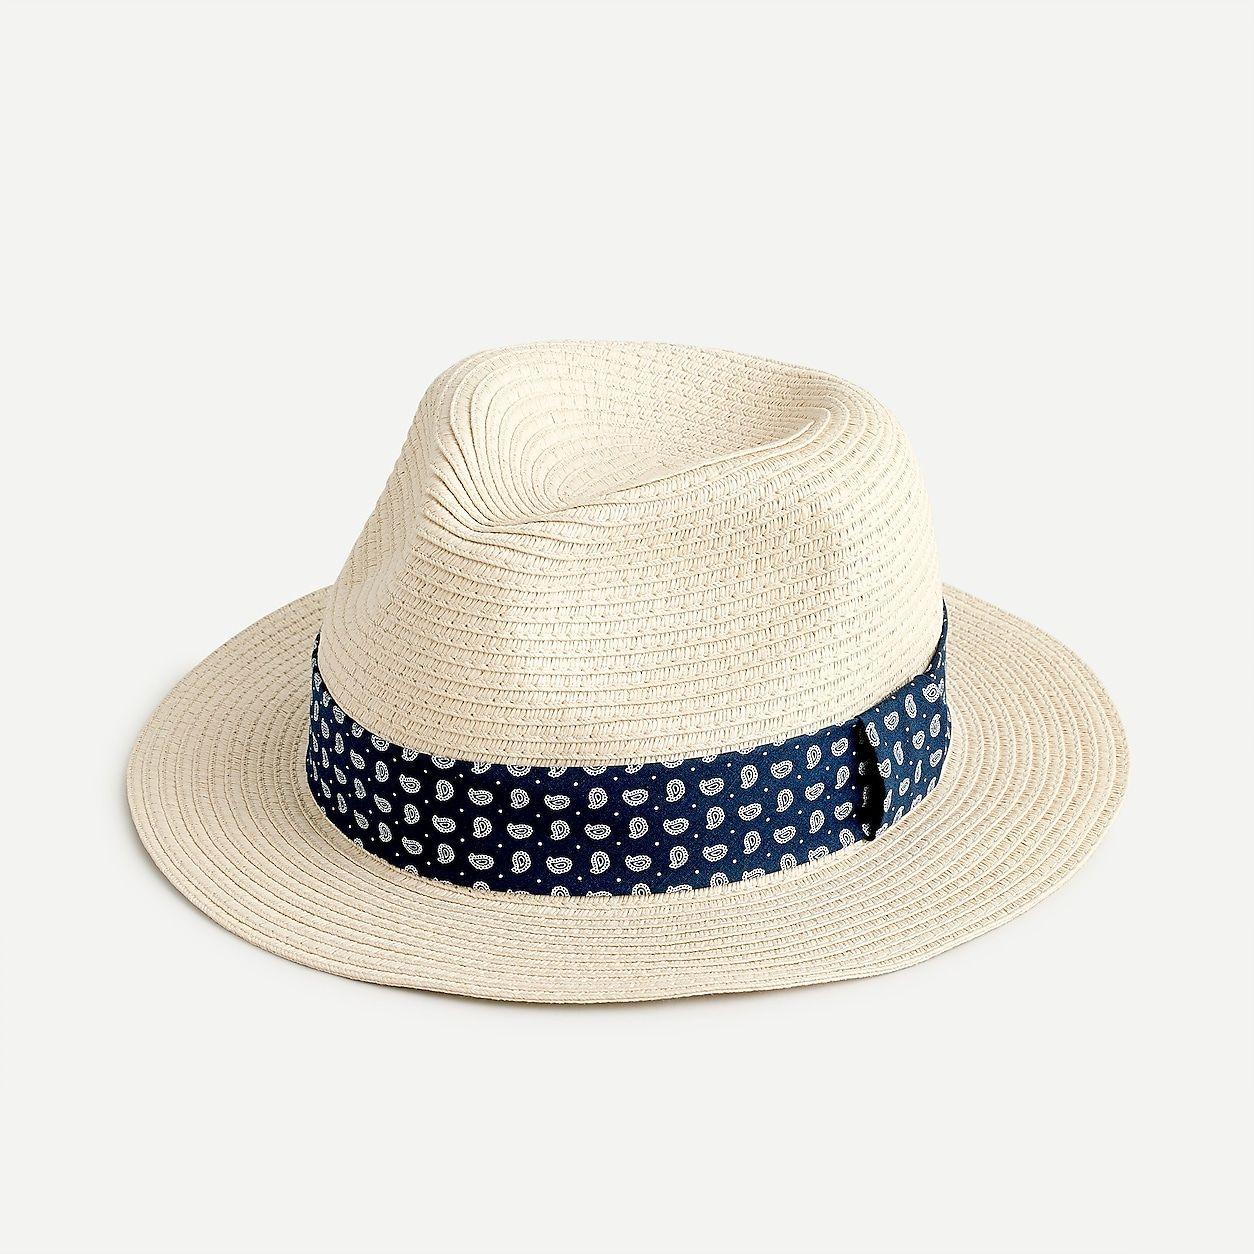 Packable Panama Hat With Bandana Band In 2021 Panama Hat Hats For Men Panama Hat Men